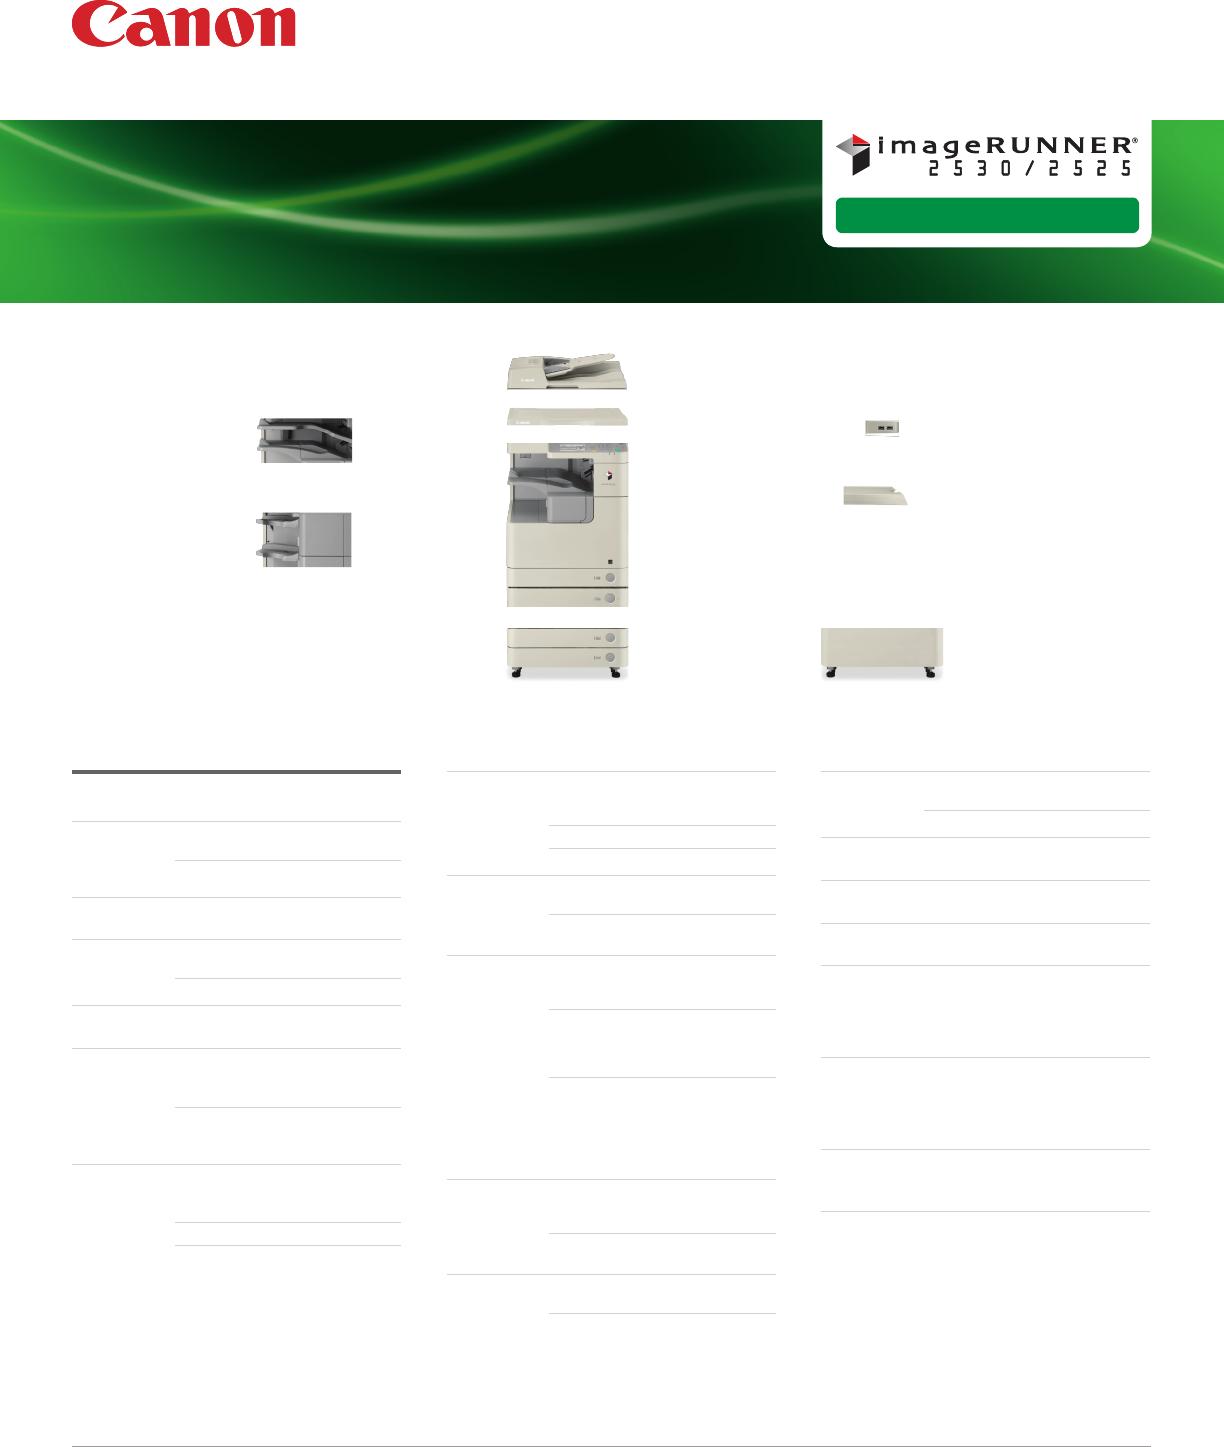 IMAGERUNNER 2525 Copier I R2530 Spec Sheet High Res